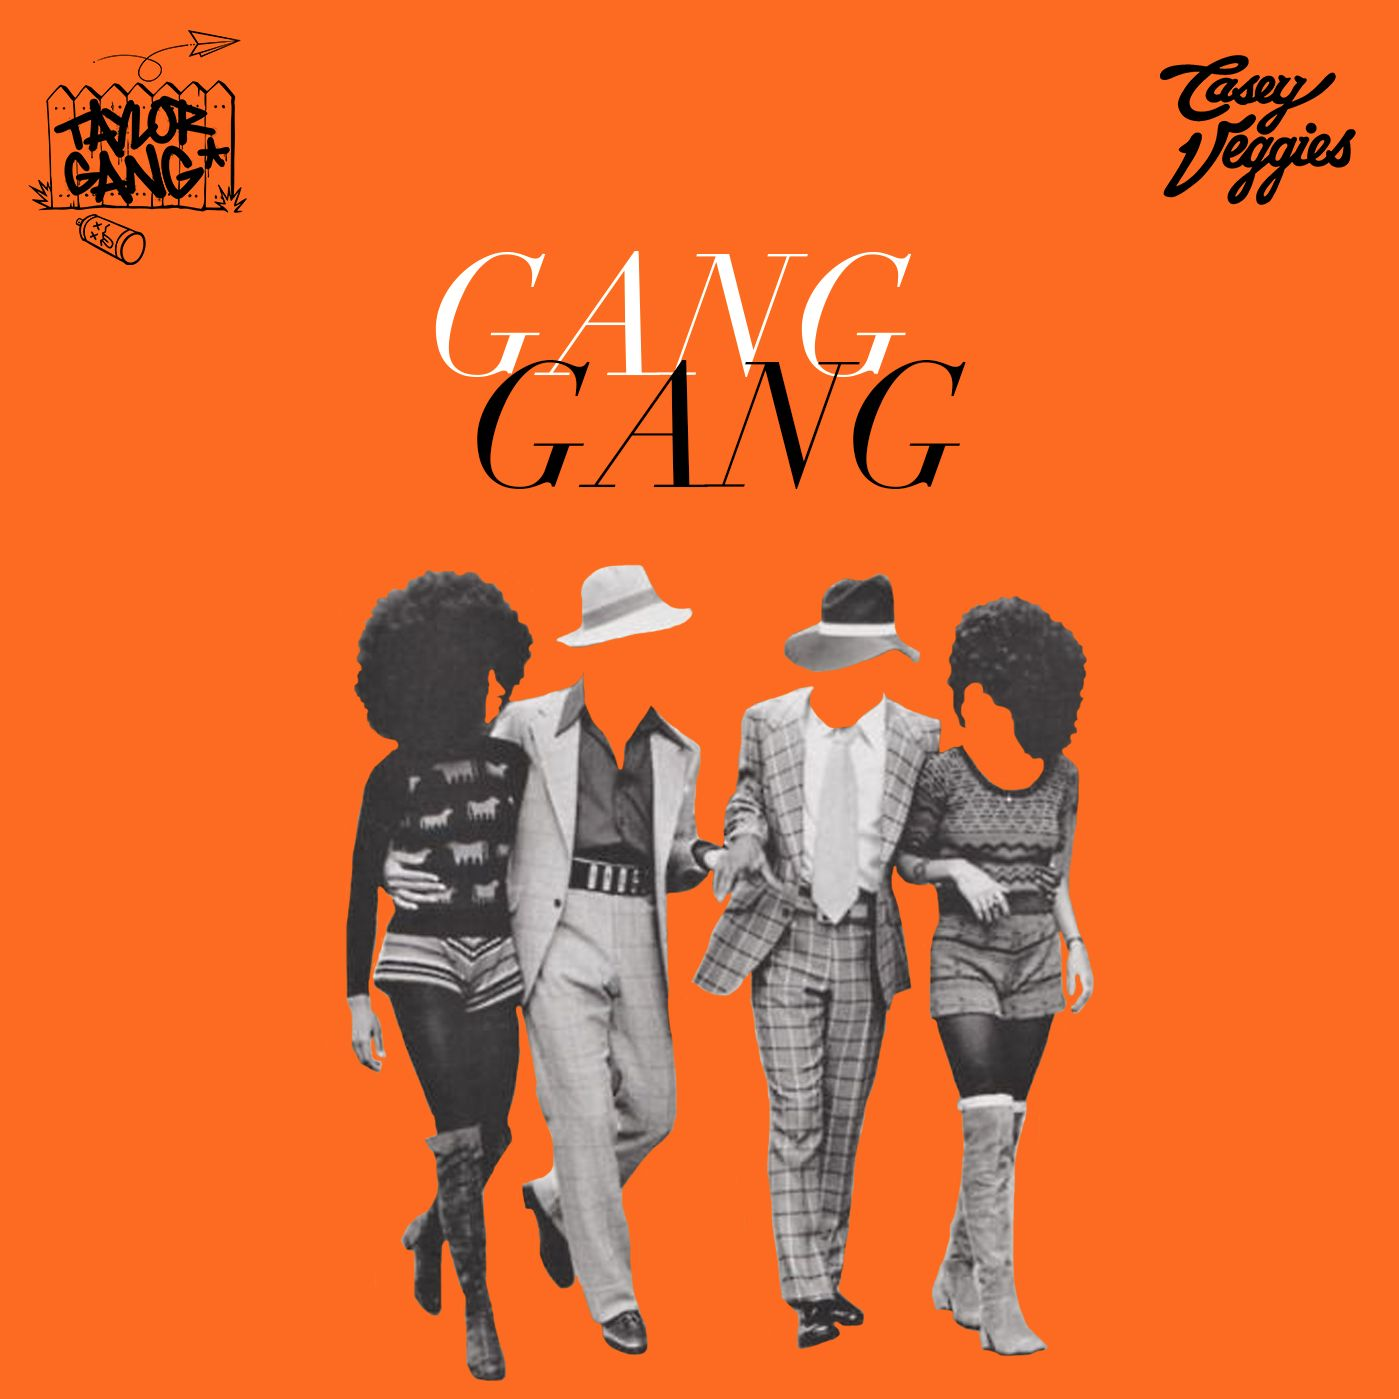 Taylor Gang – Gang Gang feat. Casey Veggies